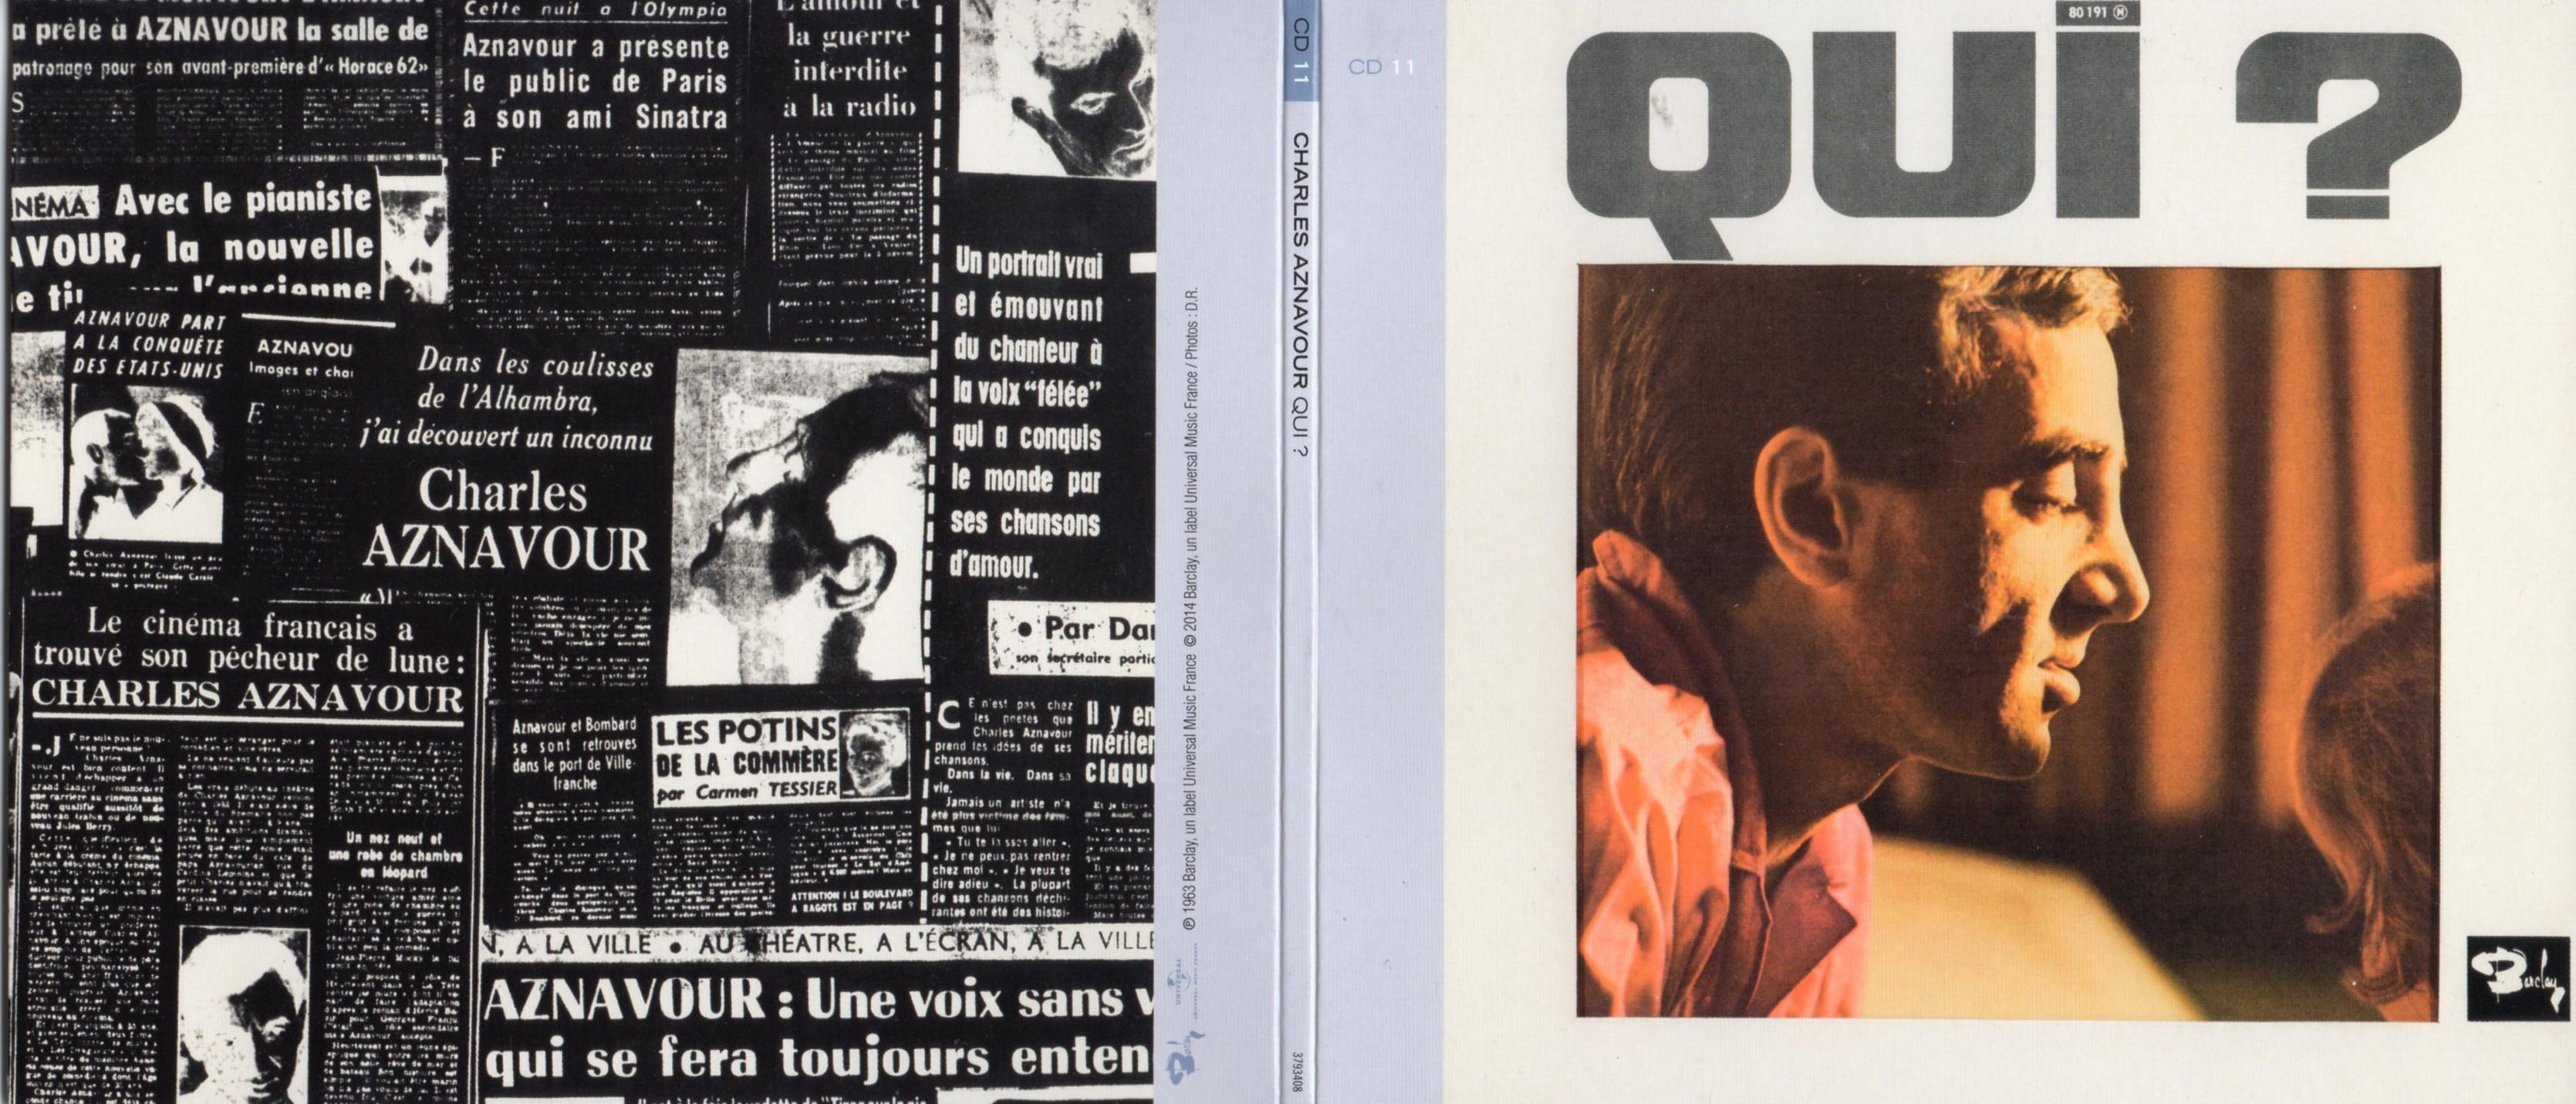 CHARLES AZNAVOUR - Qui (1963) Gatefold Card board sleeve Replica - CD